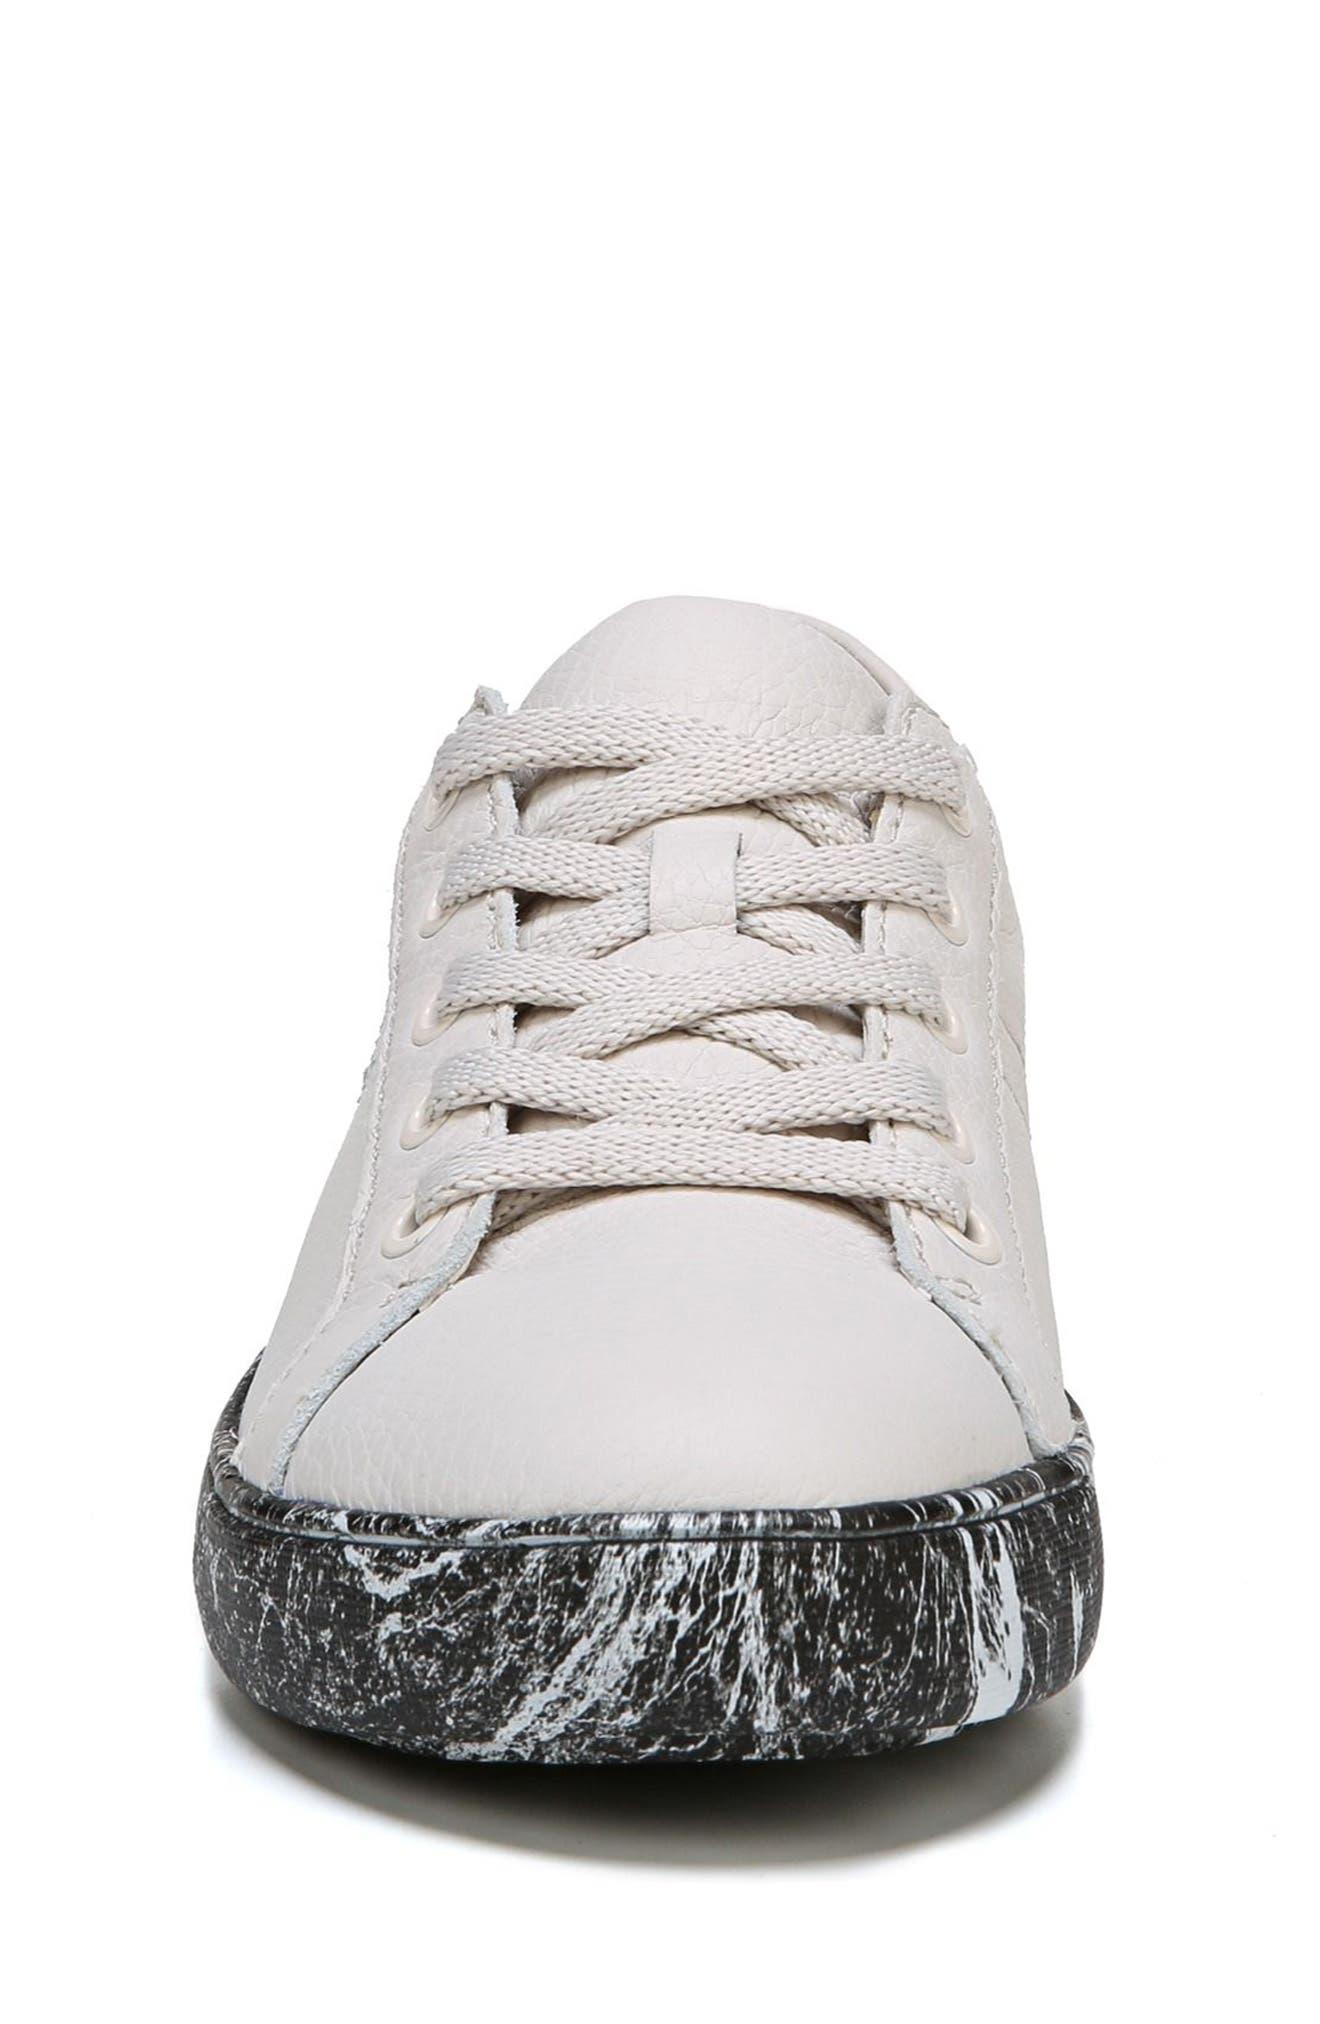 Morrison Sneaker,                             Alternate thumbnail 3, color,                             Beige Pebble Leather